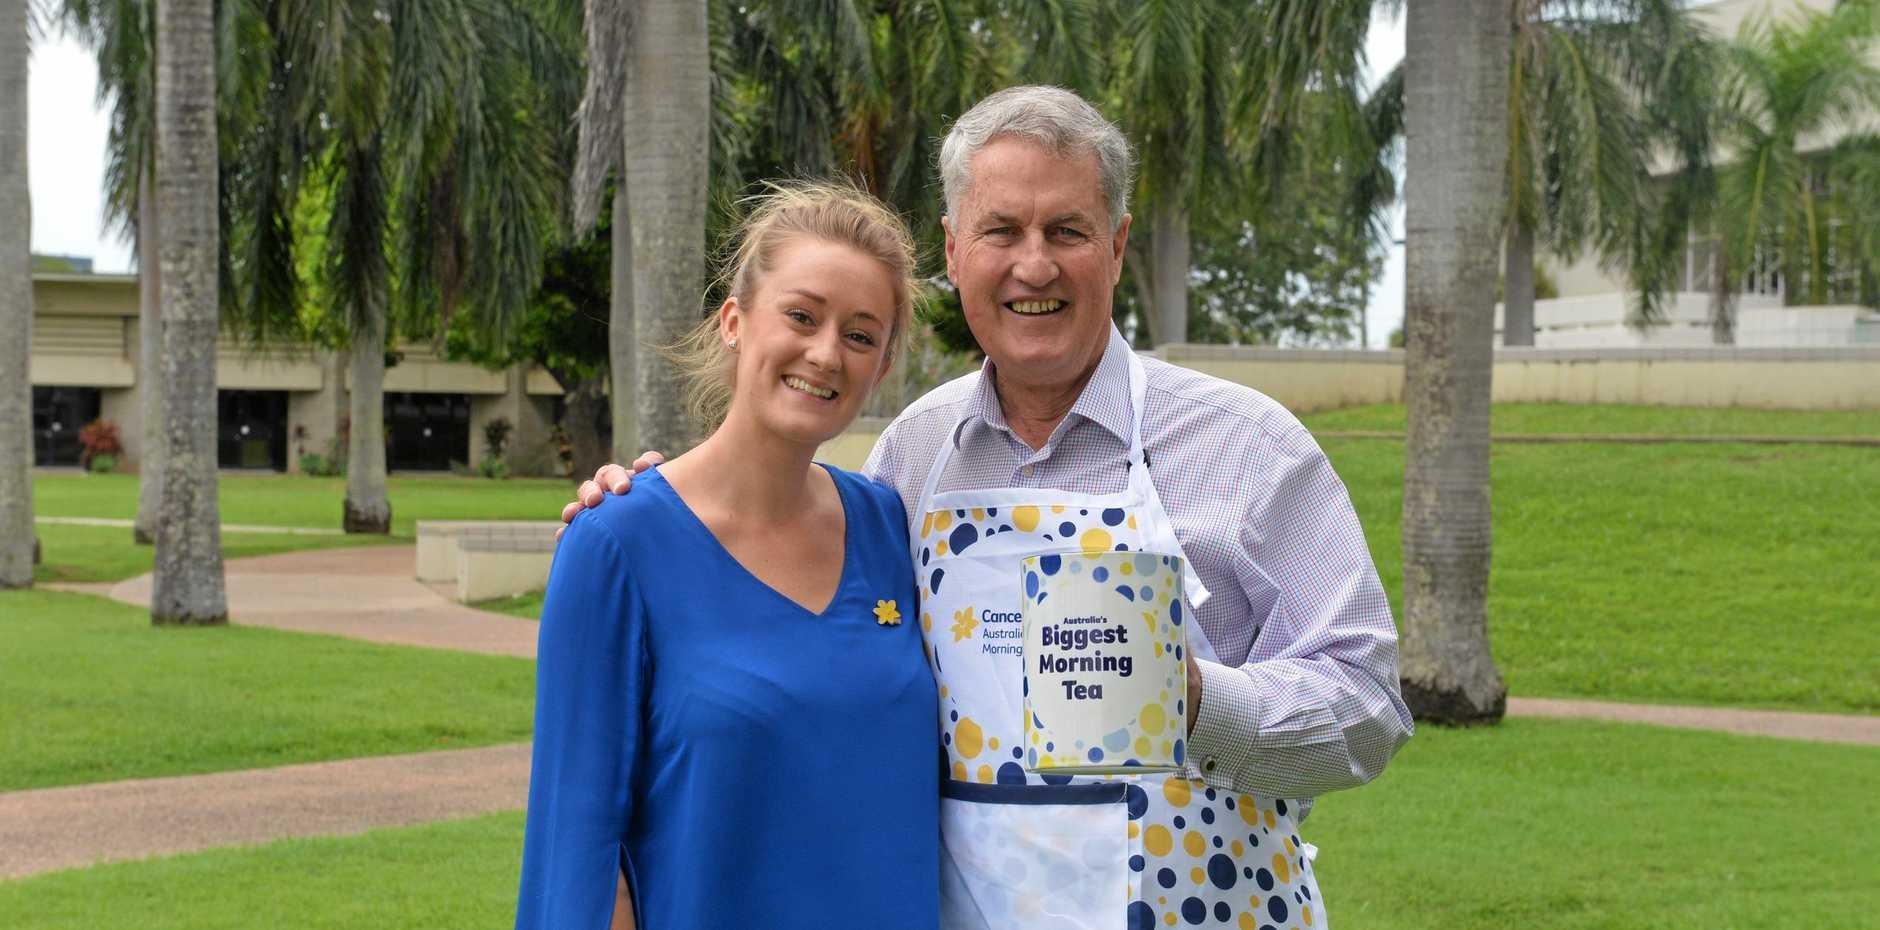 BIG SIP: Mayor Greg Williamson and Tina Holliday-Smith welcome the 'biggest' mug ready for Australia's Biggest Morning Tea.